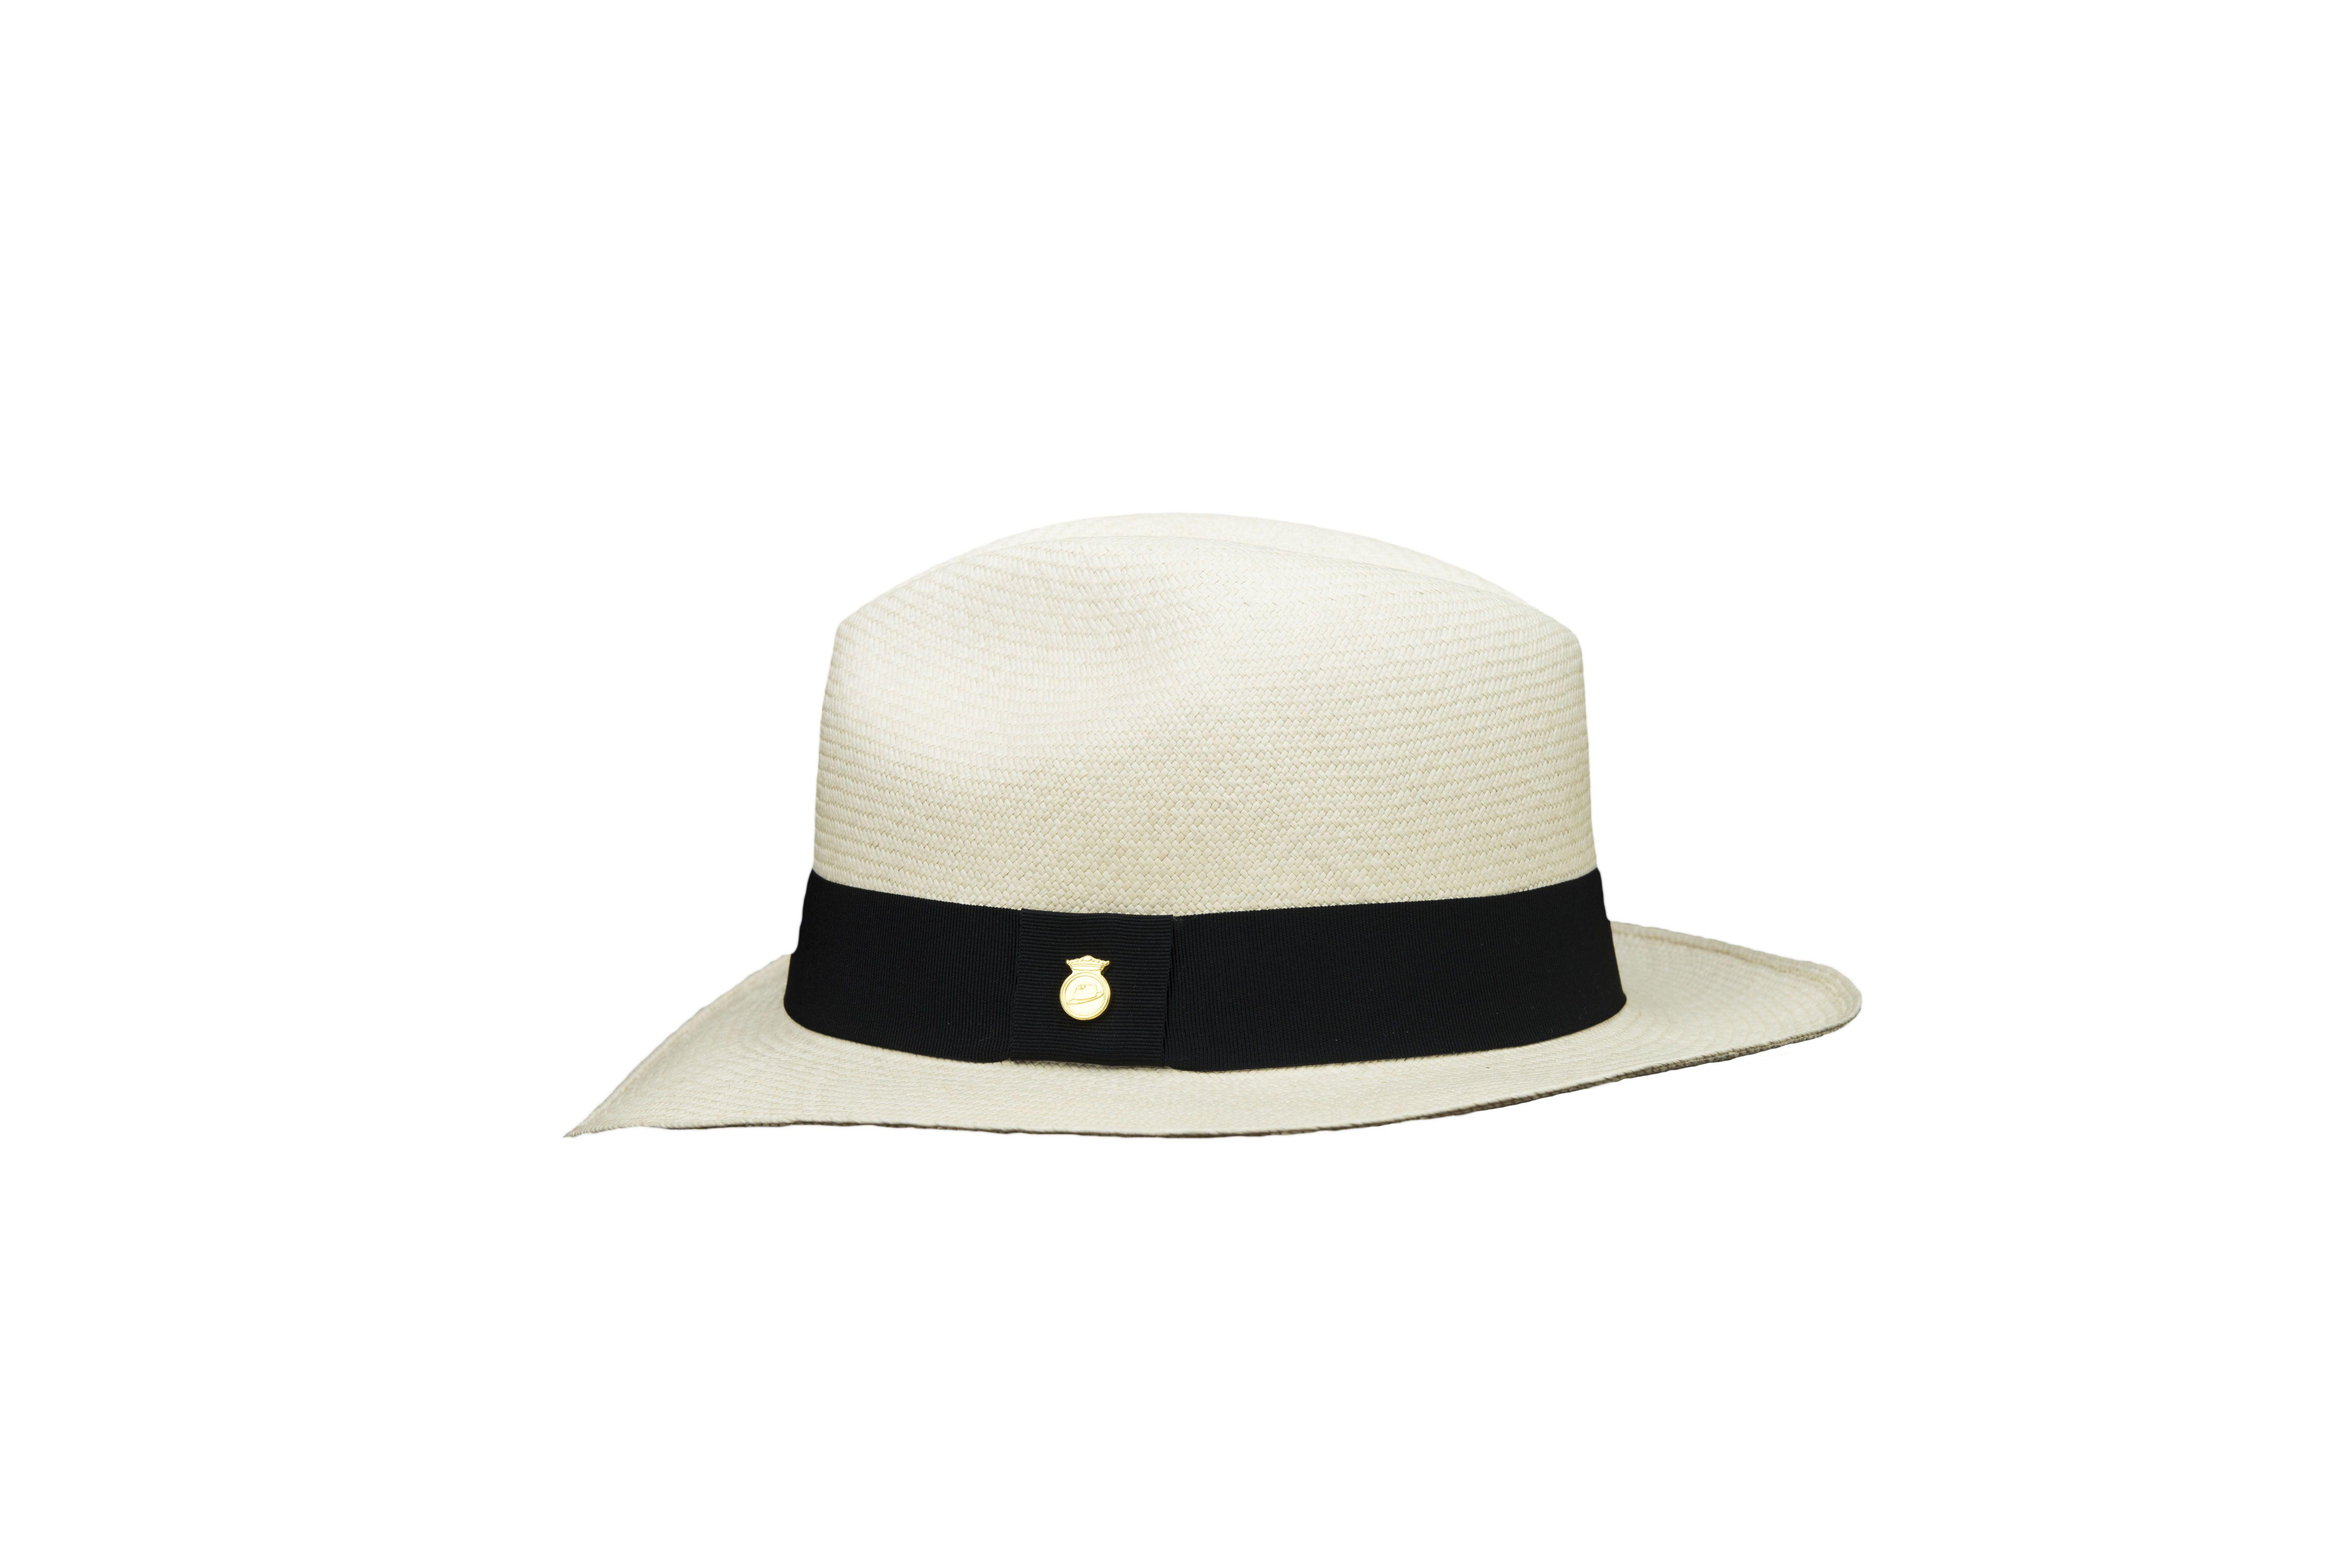 f8e59070b9d16e Precious Authentic Montecristi Panama hat performed entirely manually in  Montecristi - Ecuador by one of the